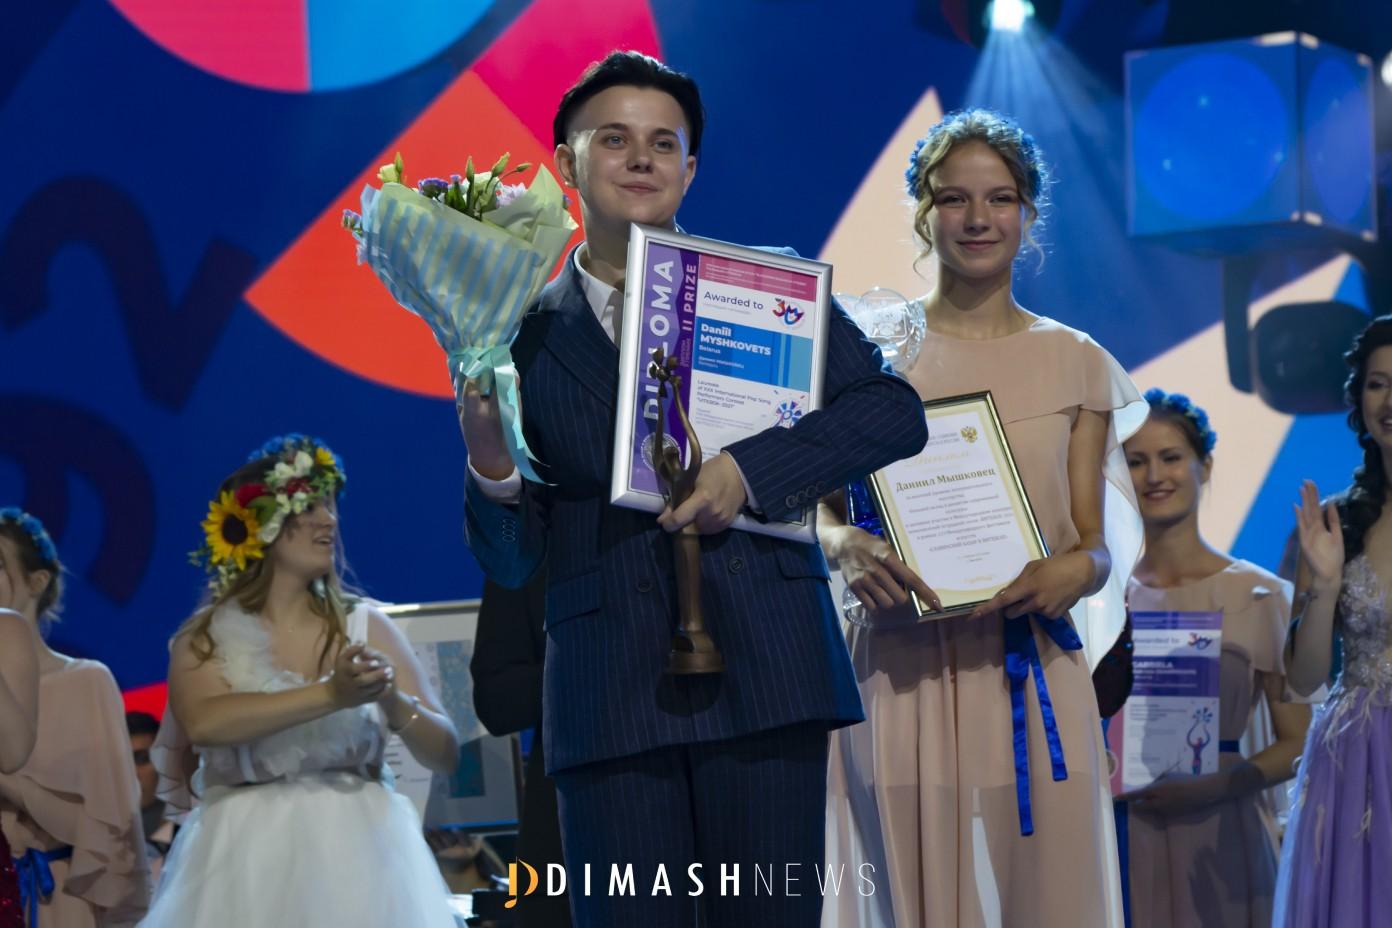 Ruhiya Baidukenova from Kazakhstan won the Grand Prix at the